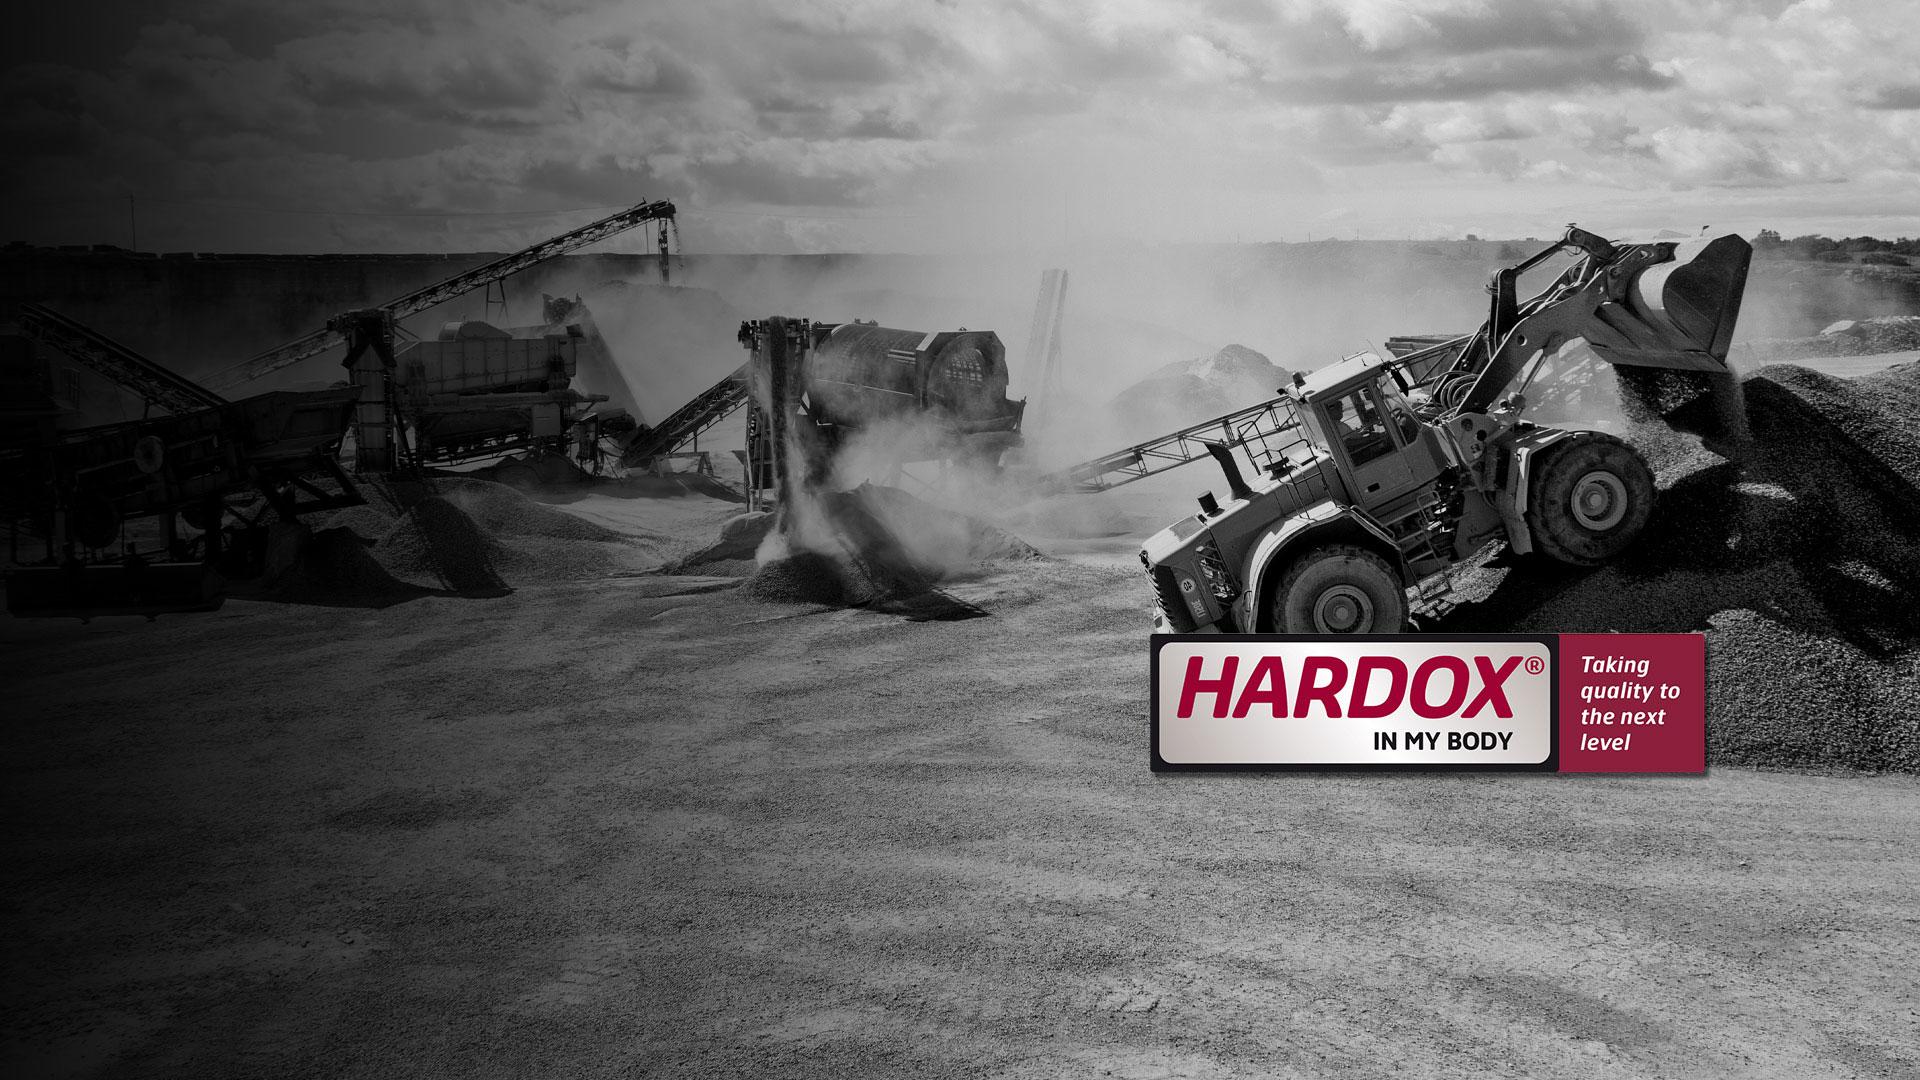 Les avantages de Hardox In My Body